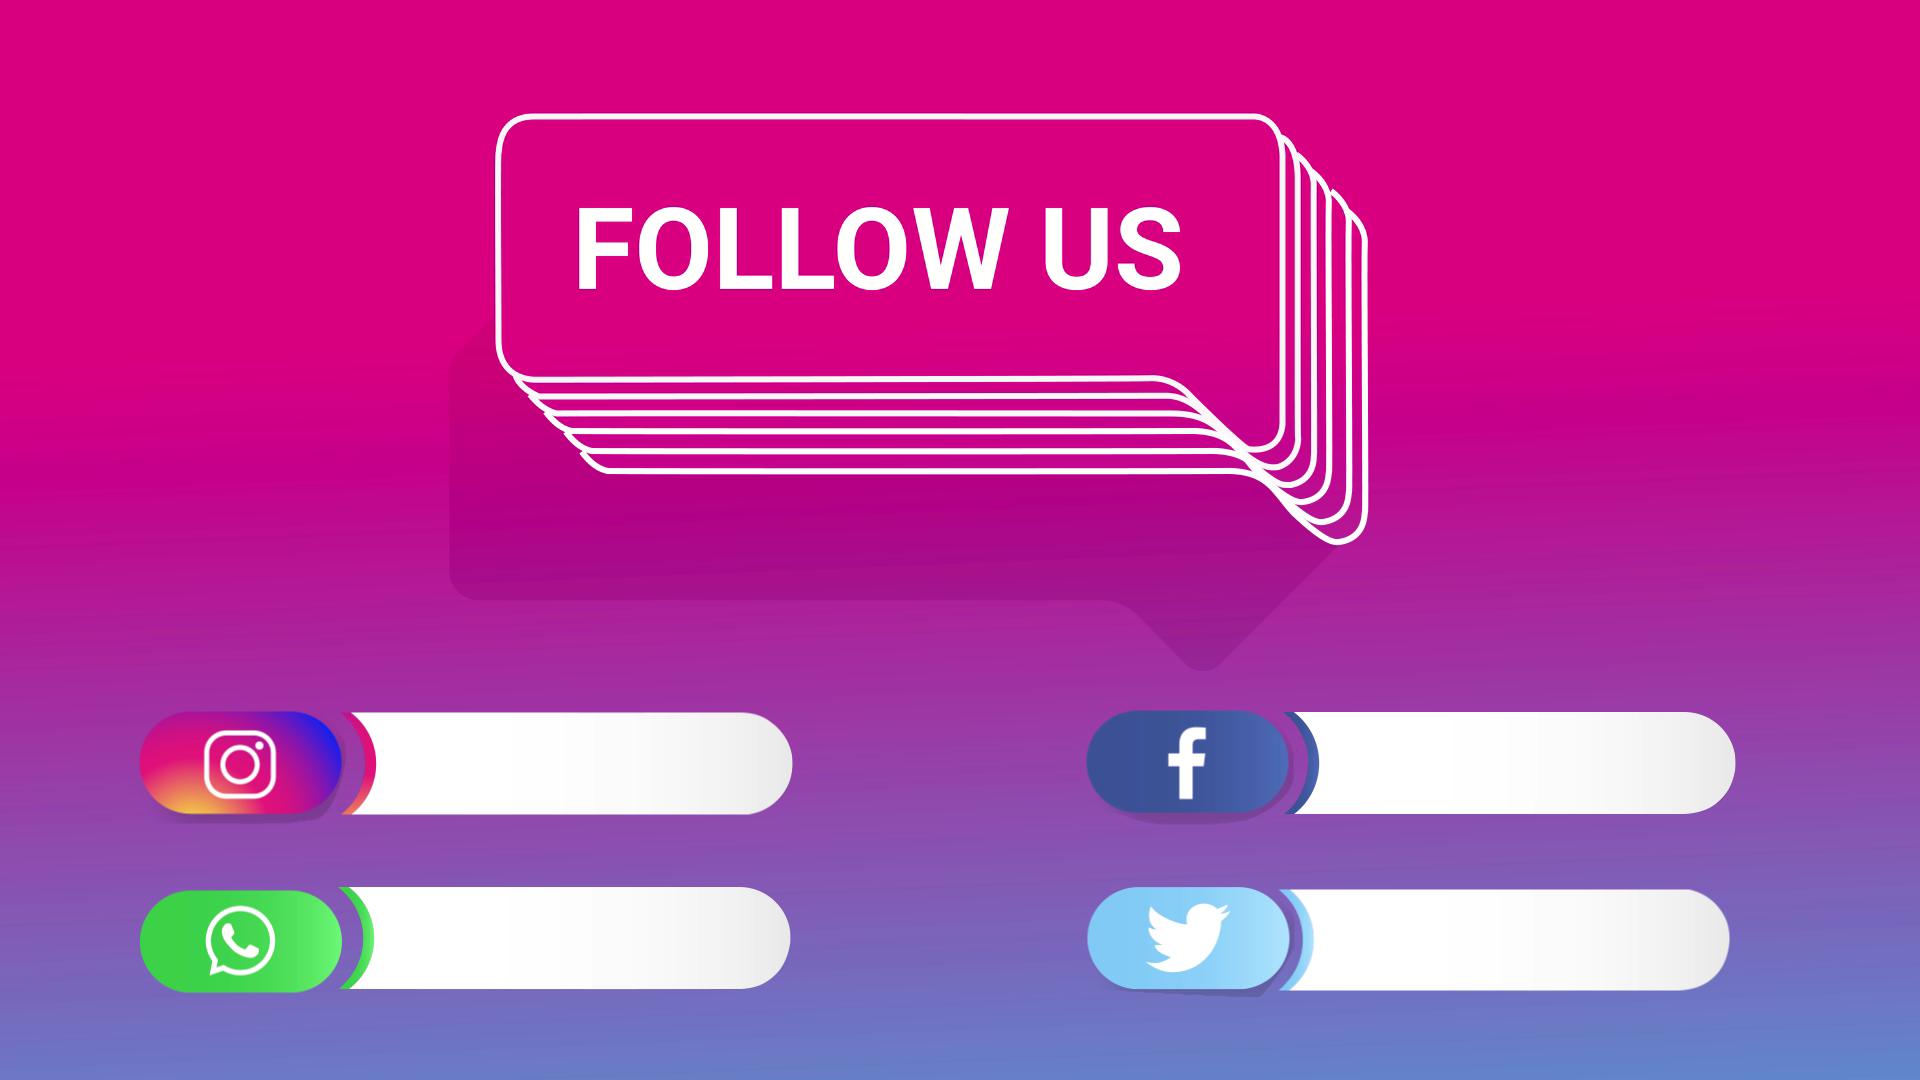 Follow Us Text Social Media